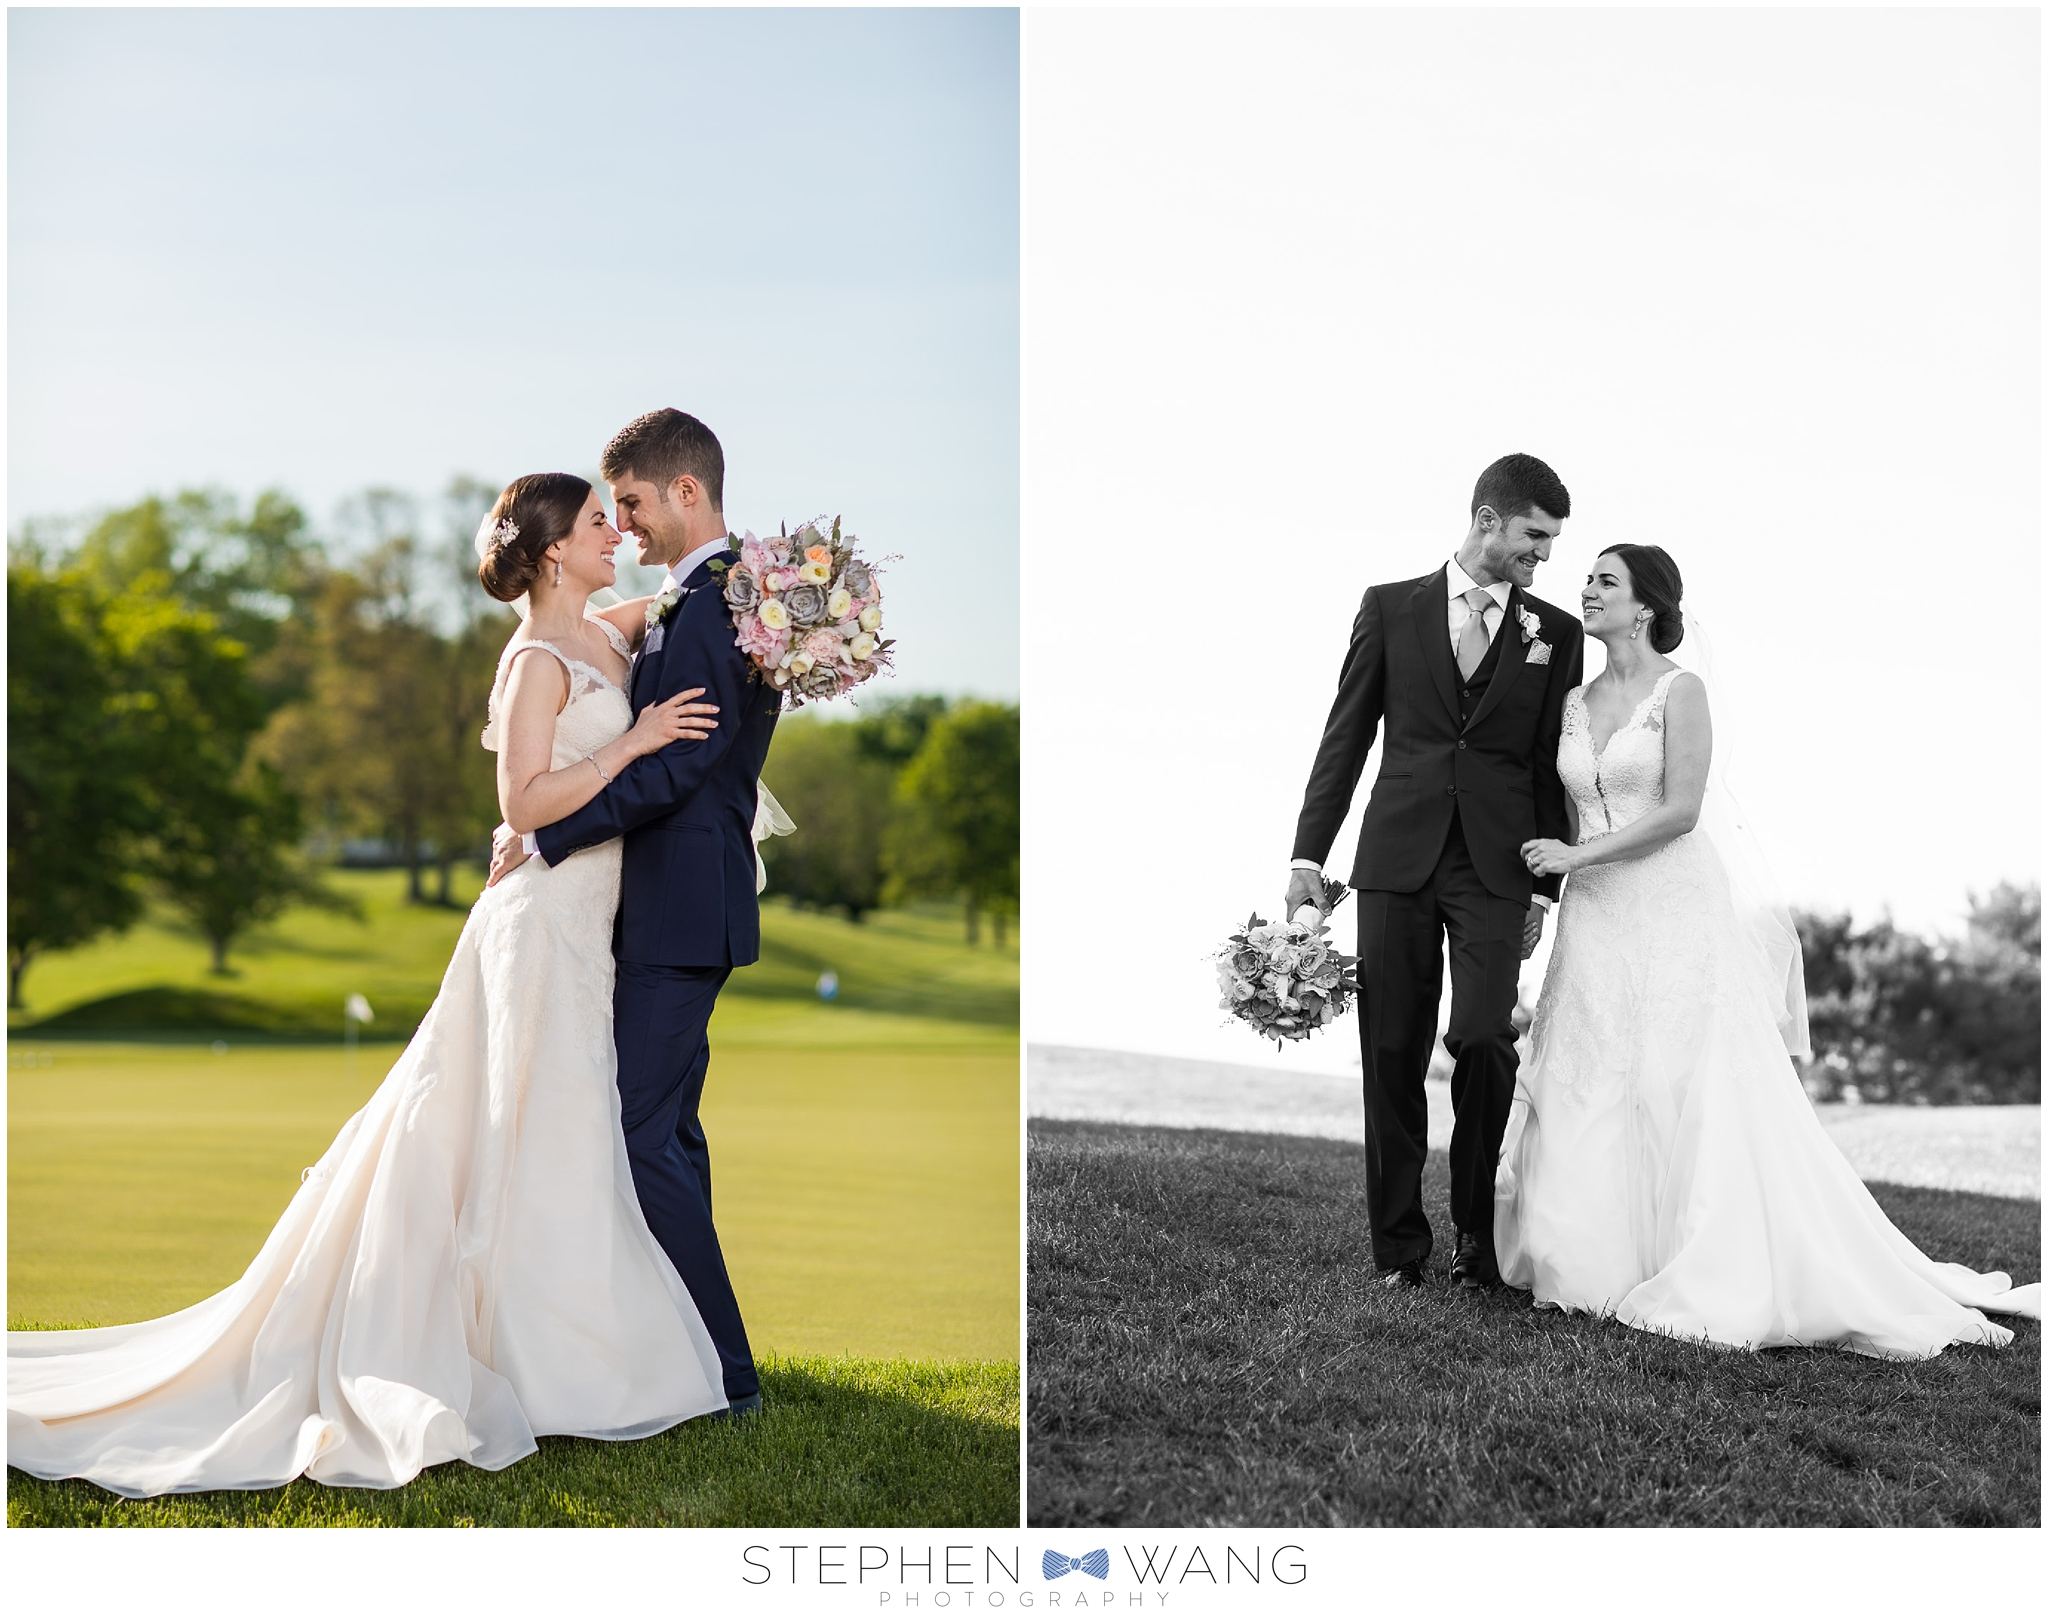 Stephen Wang Photography Shorehaven Norwalk CT Wedding Photographer connecticut shoreline shore haven - 26.jpg